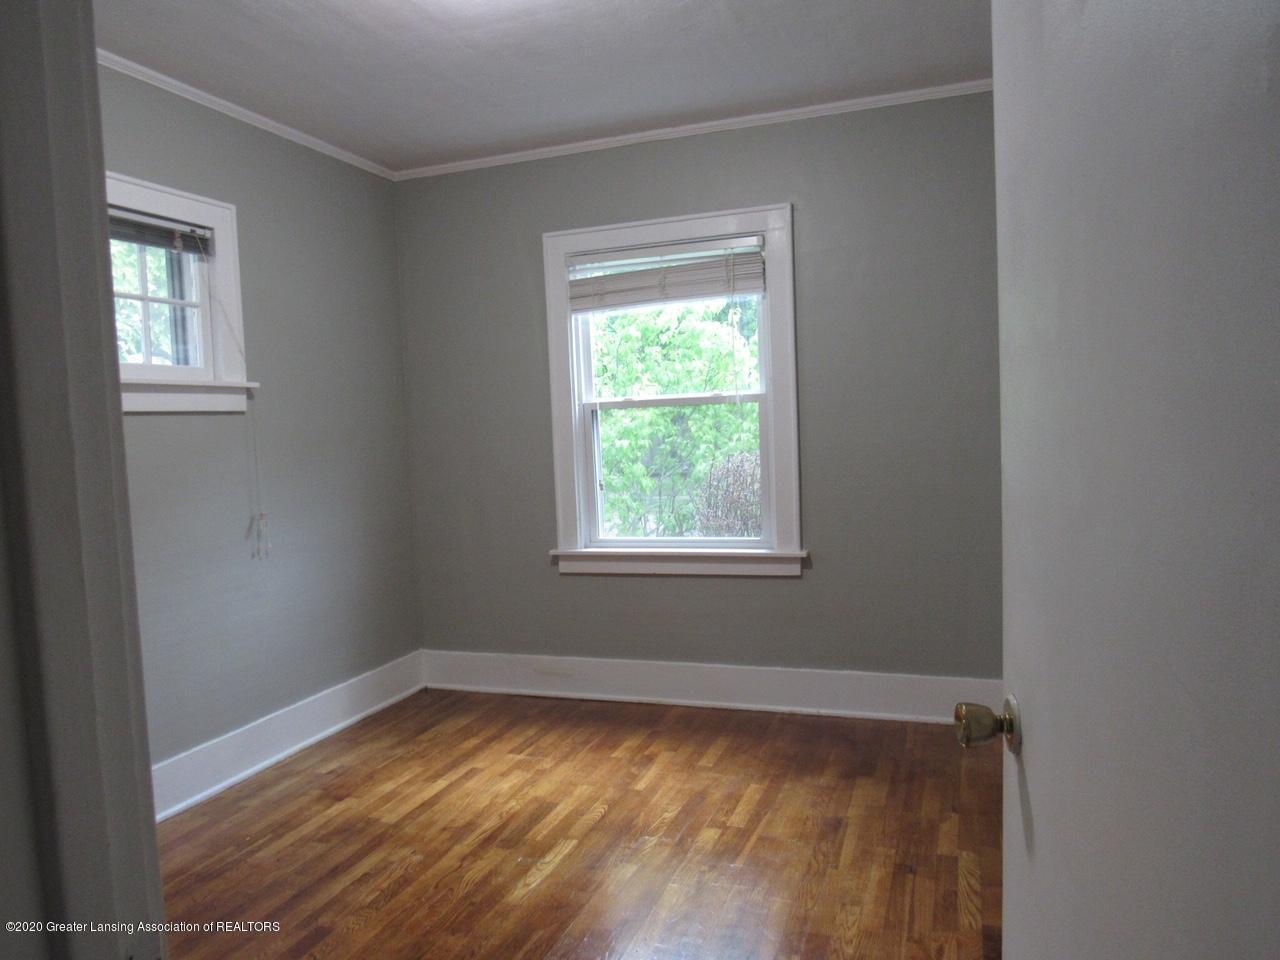 817 Durant St - Bedroom - 9